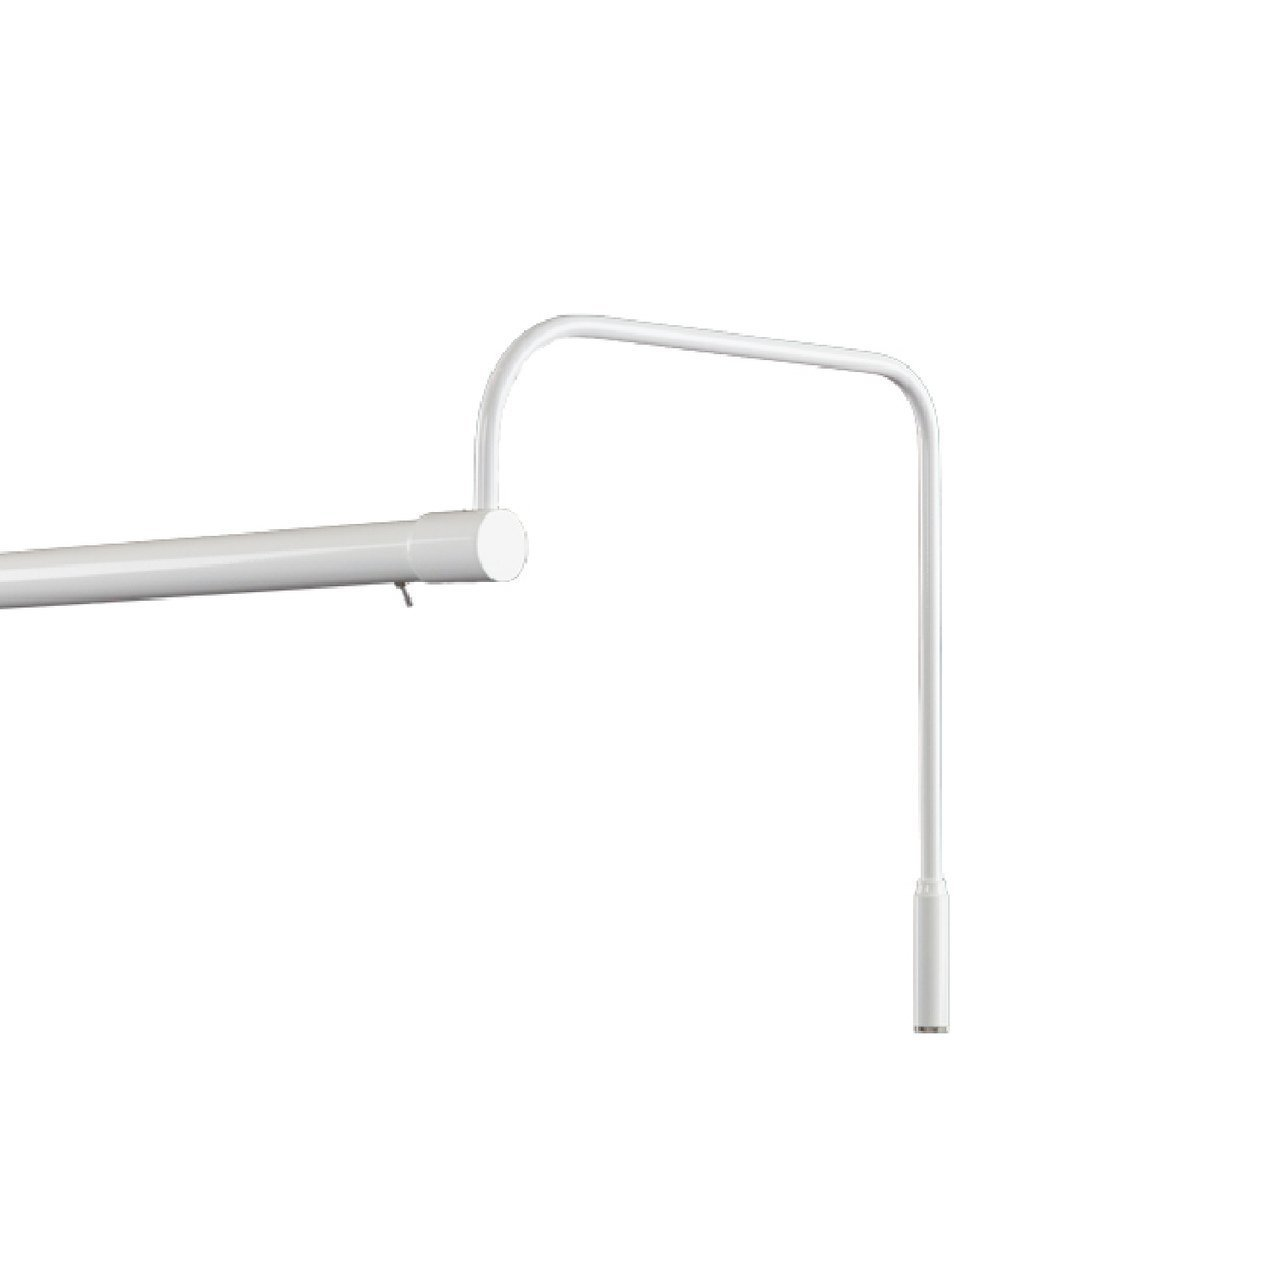 16 Cocoweb SLED16MB Tru-Slim LED Picture Light Mahogany Bronze